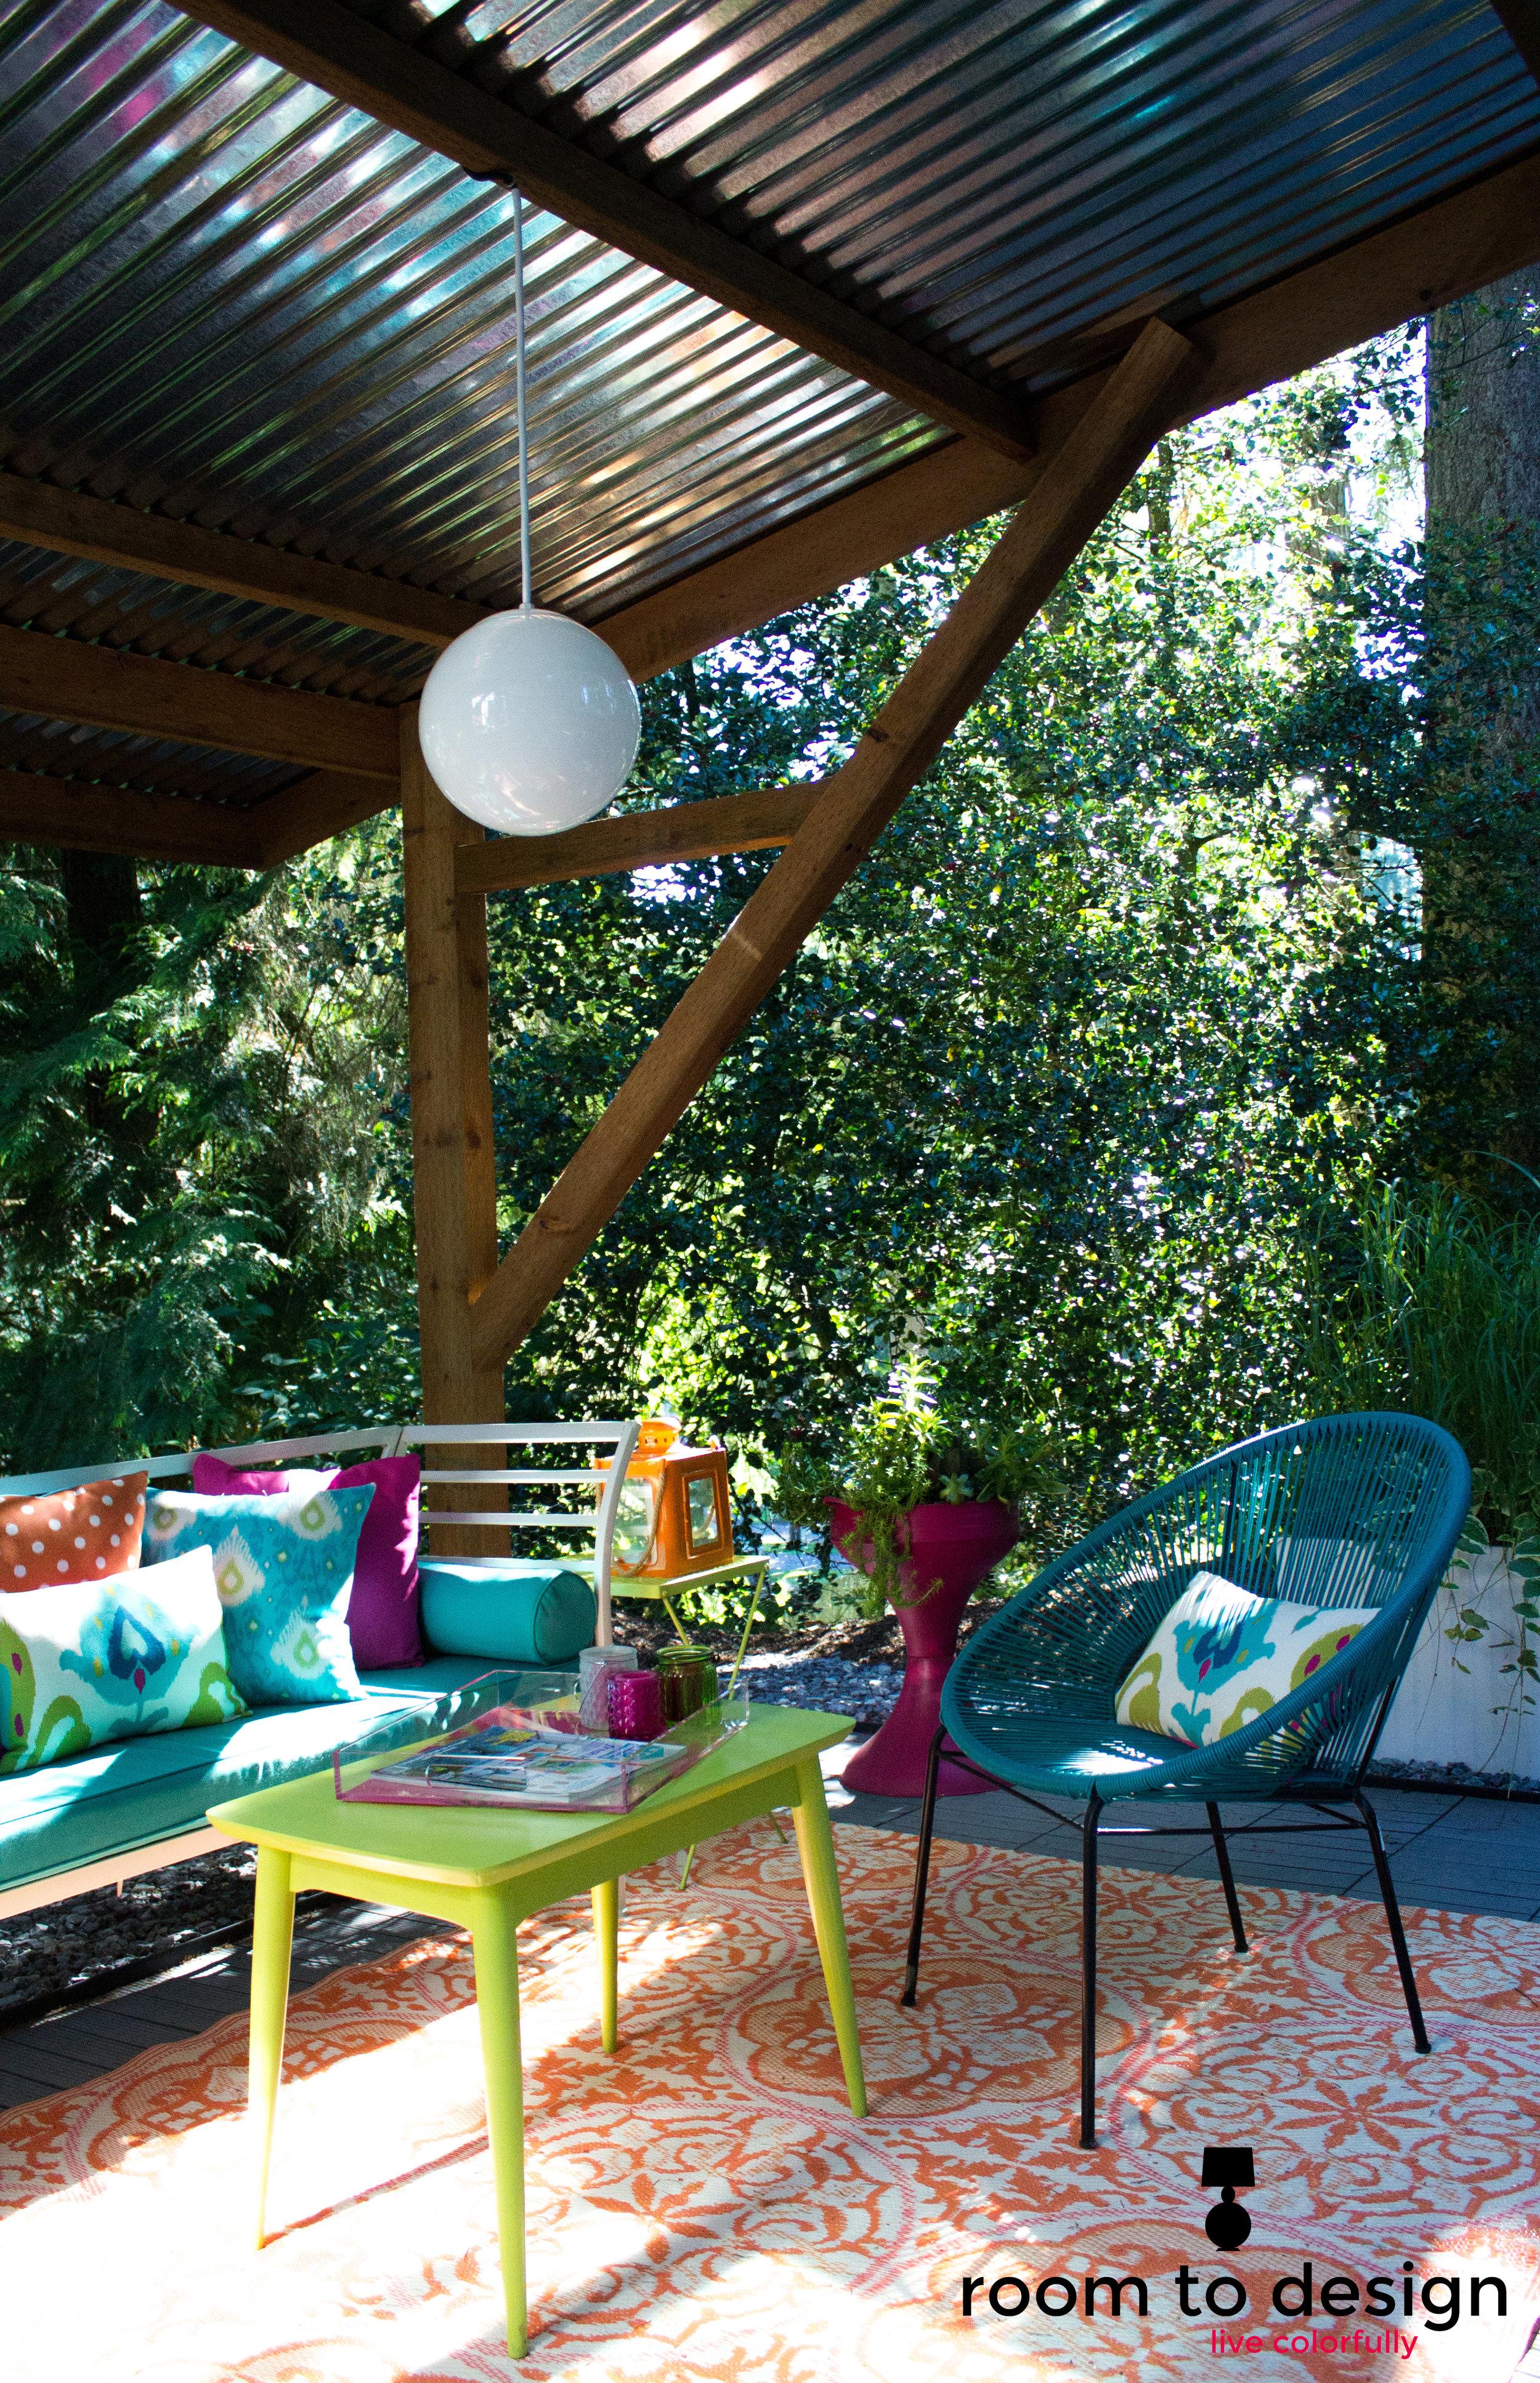 woodinville-interior-designer.jpg